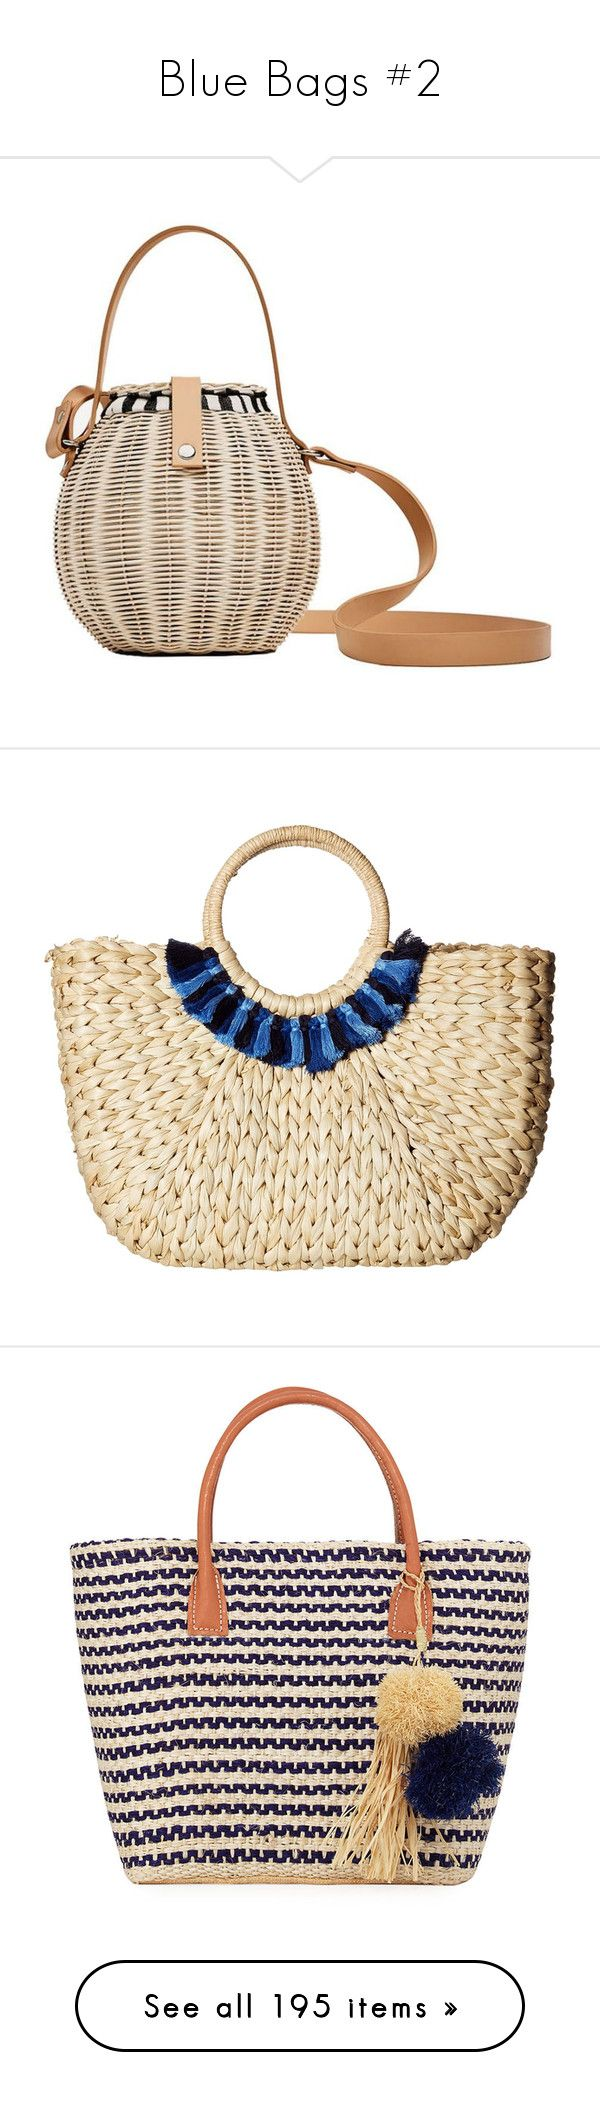 """Blue Bags #2"" by kikikoji ❤ liked on Polyvore featuring bags, handbags, white purse, straw bags, white handbags, woven straw bag, polka dot bag, shoulder bags, yellow crossbody and prada handbags"